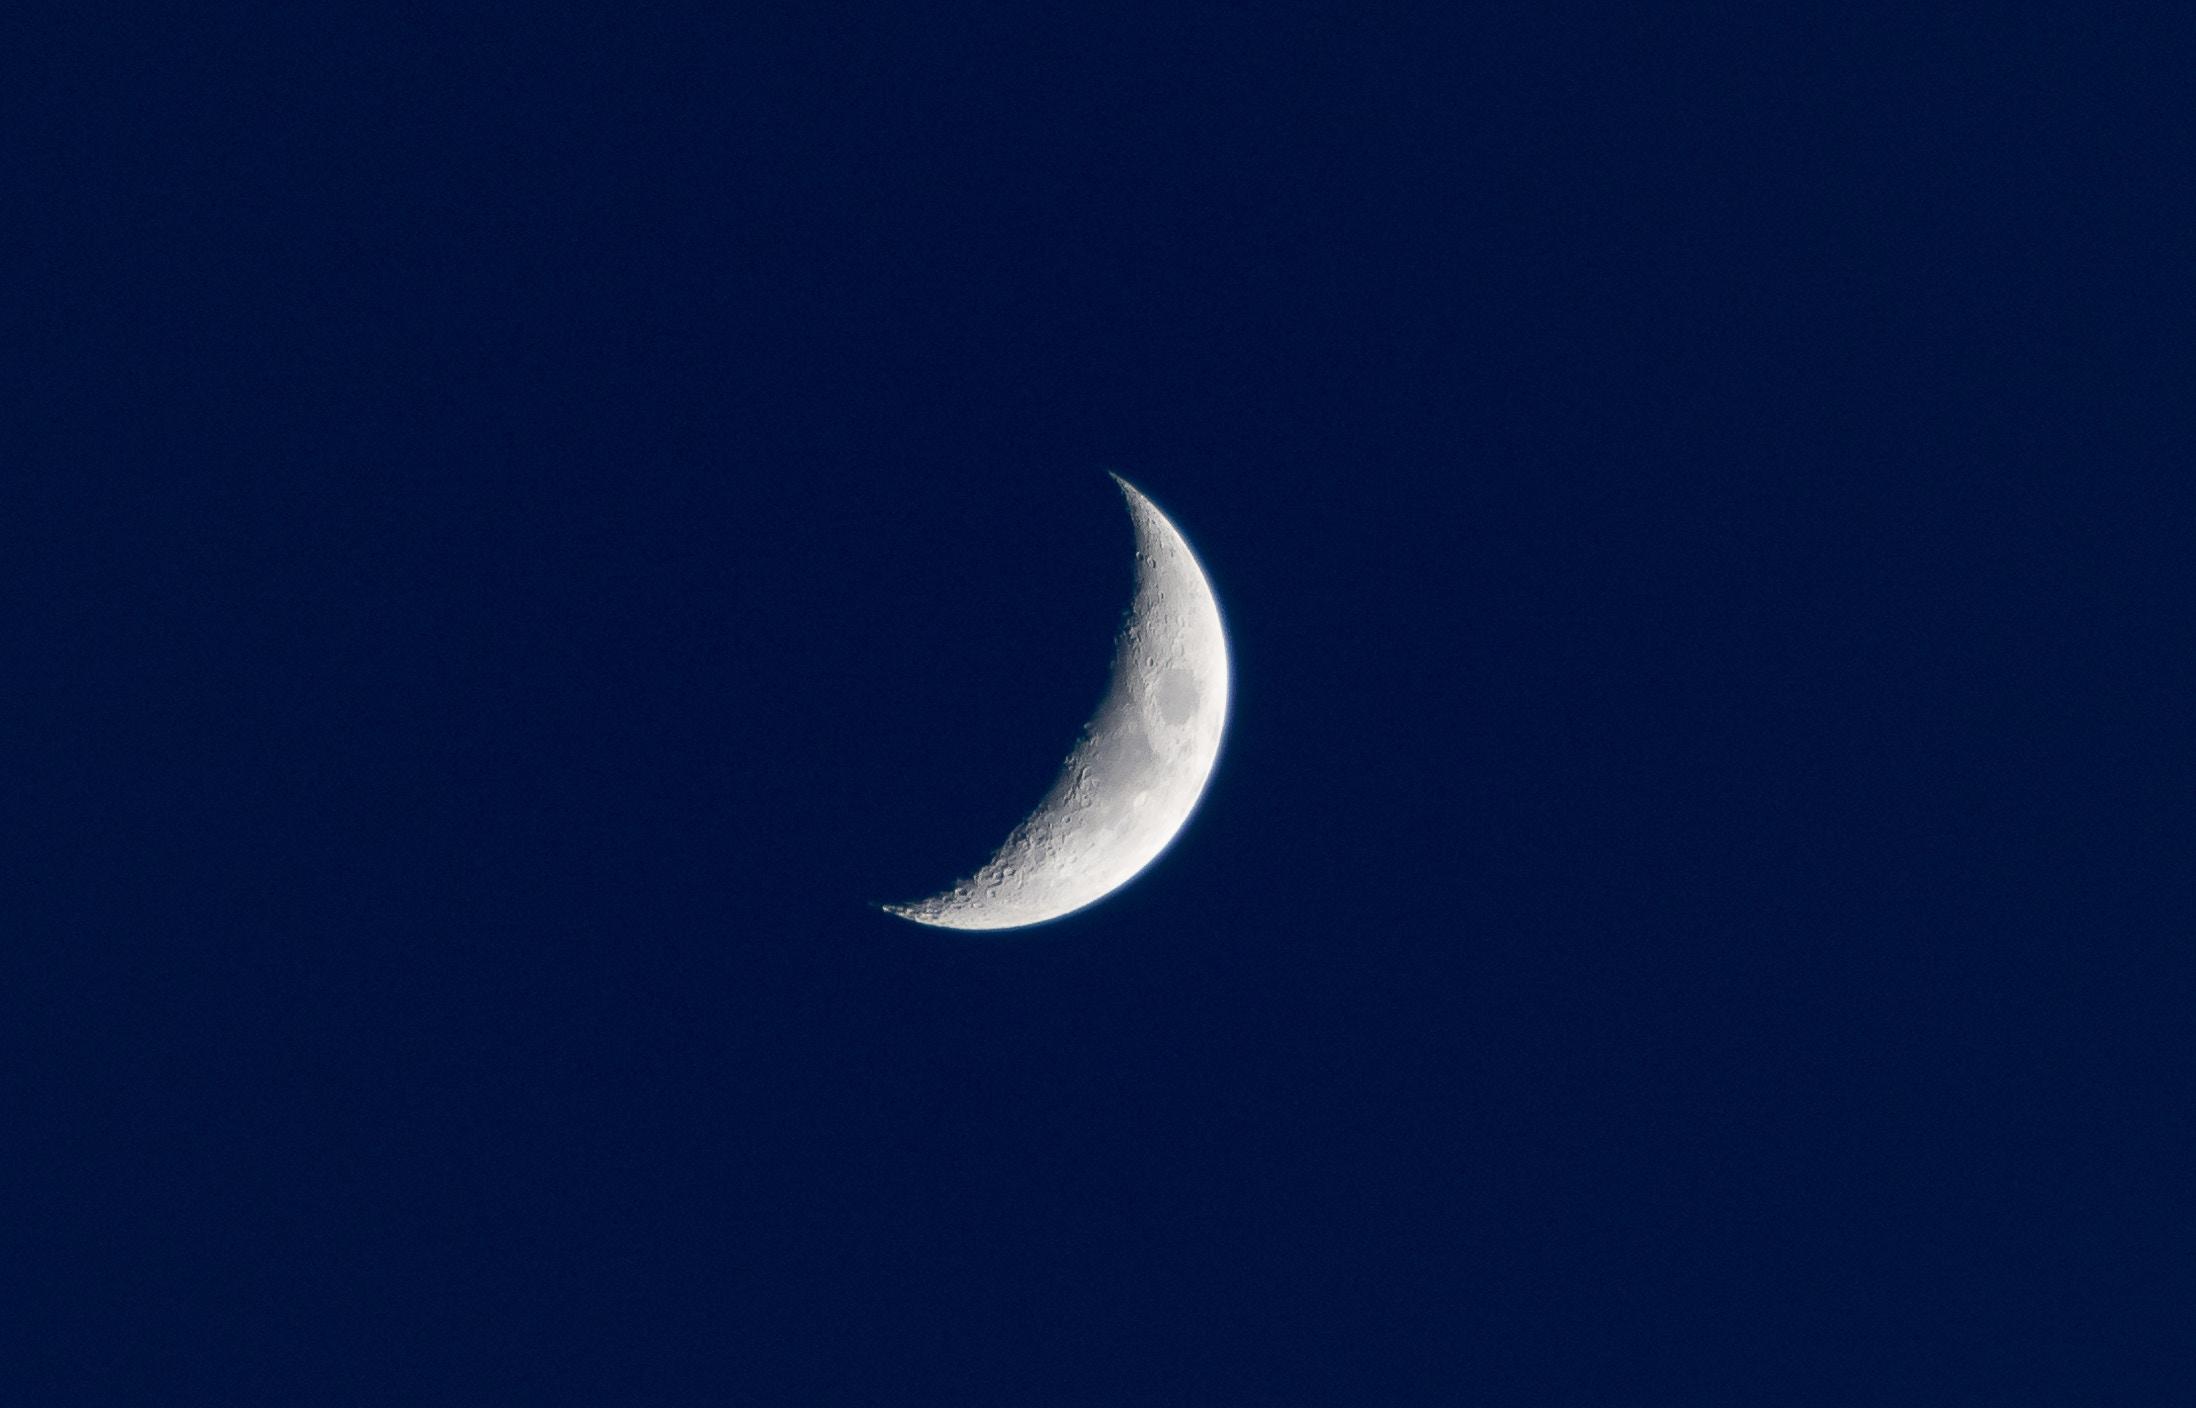 Gambar Langit Malam Suasana Siang Hari Fenomena Bulan Sabit